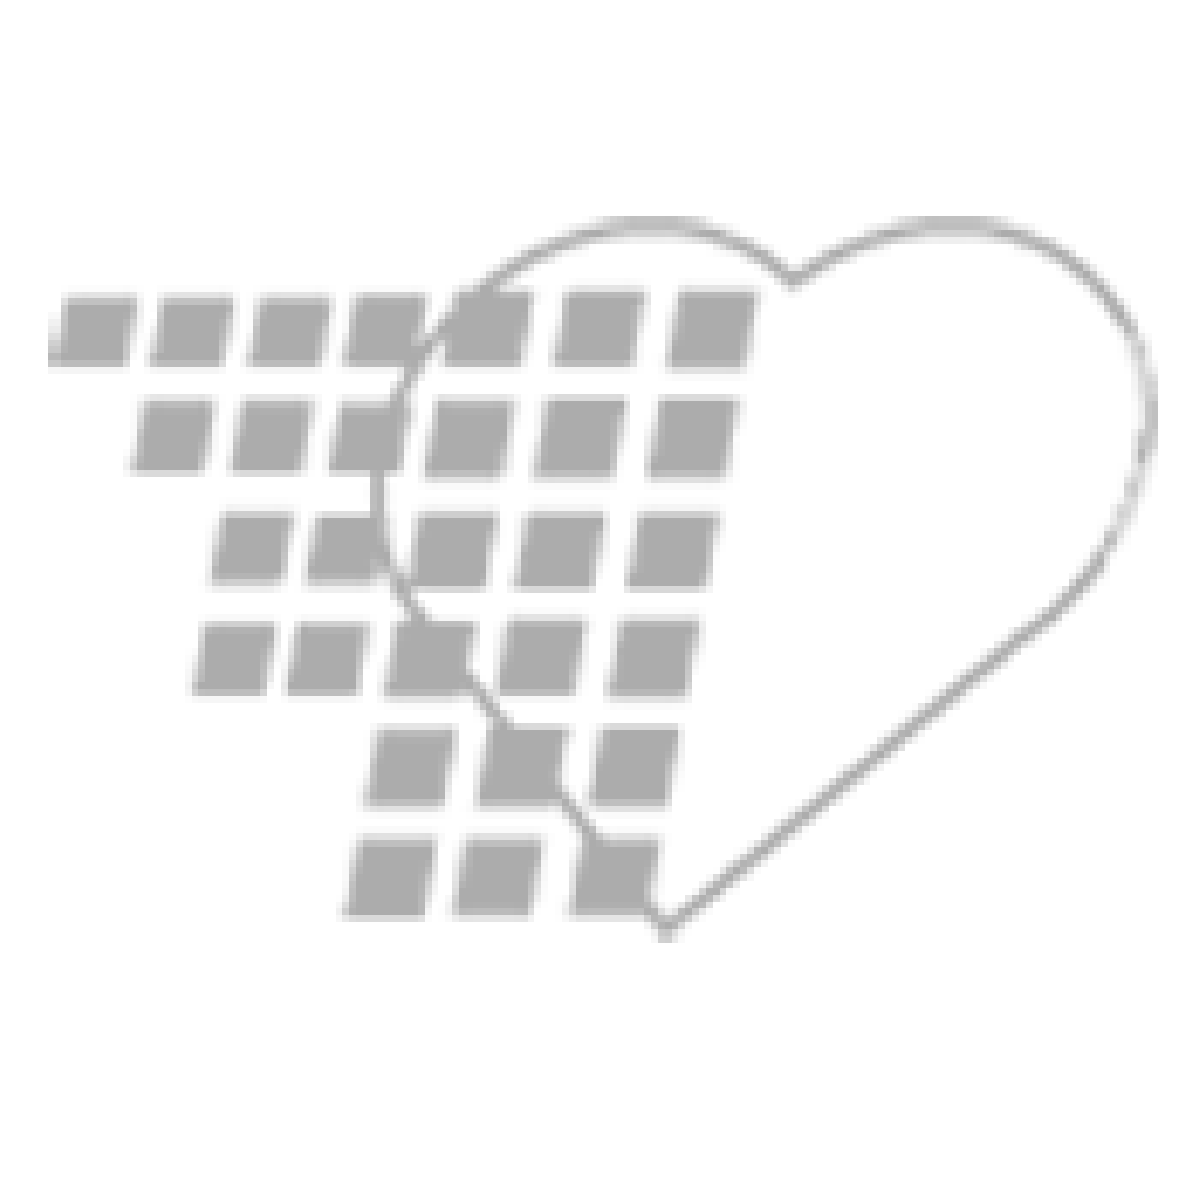 06-93-0085 - Demo Dose® Levothryroxyin 50 mg - 1000 Pills/Jar